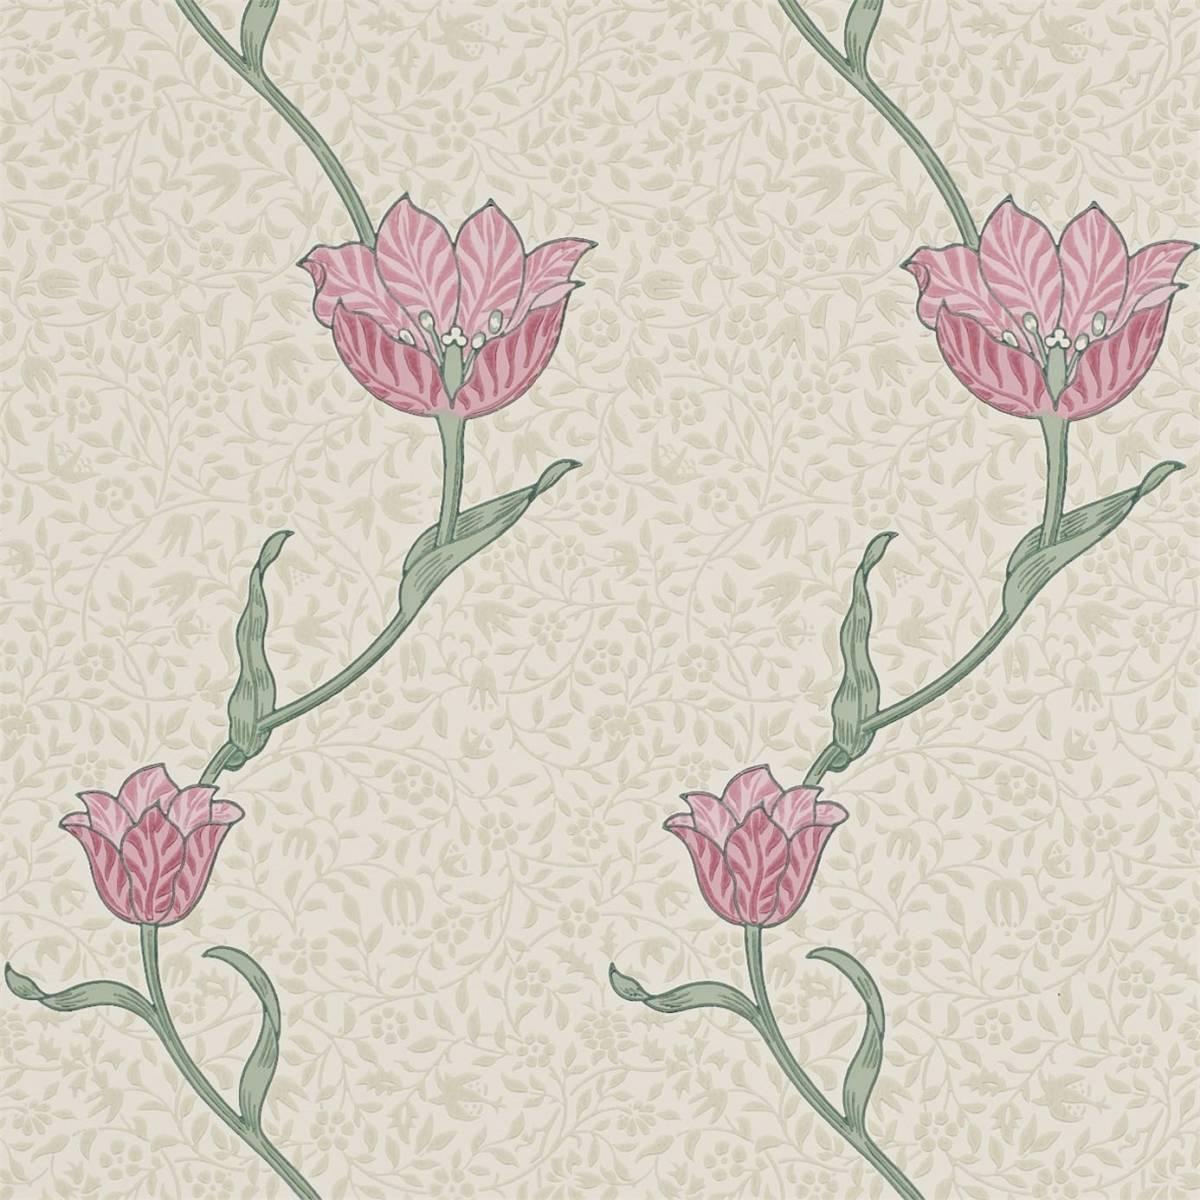 Garden Tulip Wallpaper Rose Thyme 210391 William